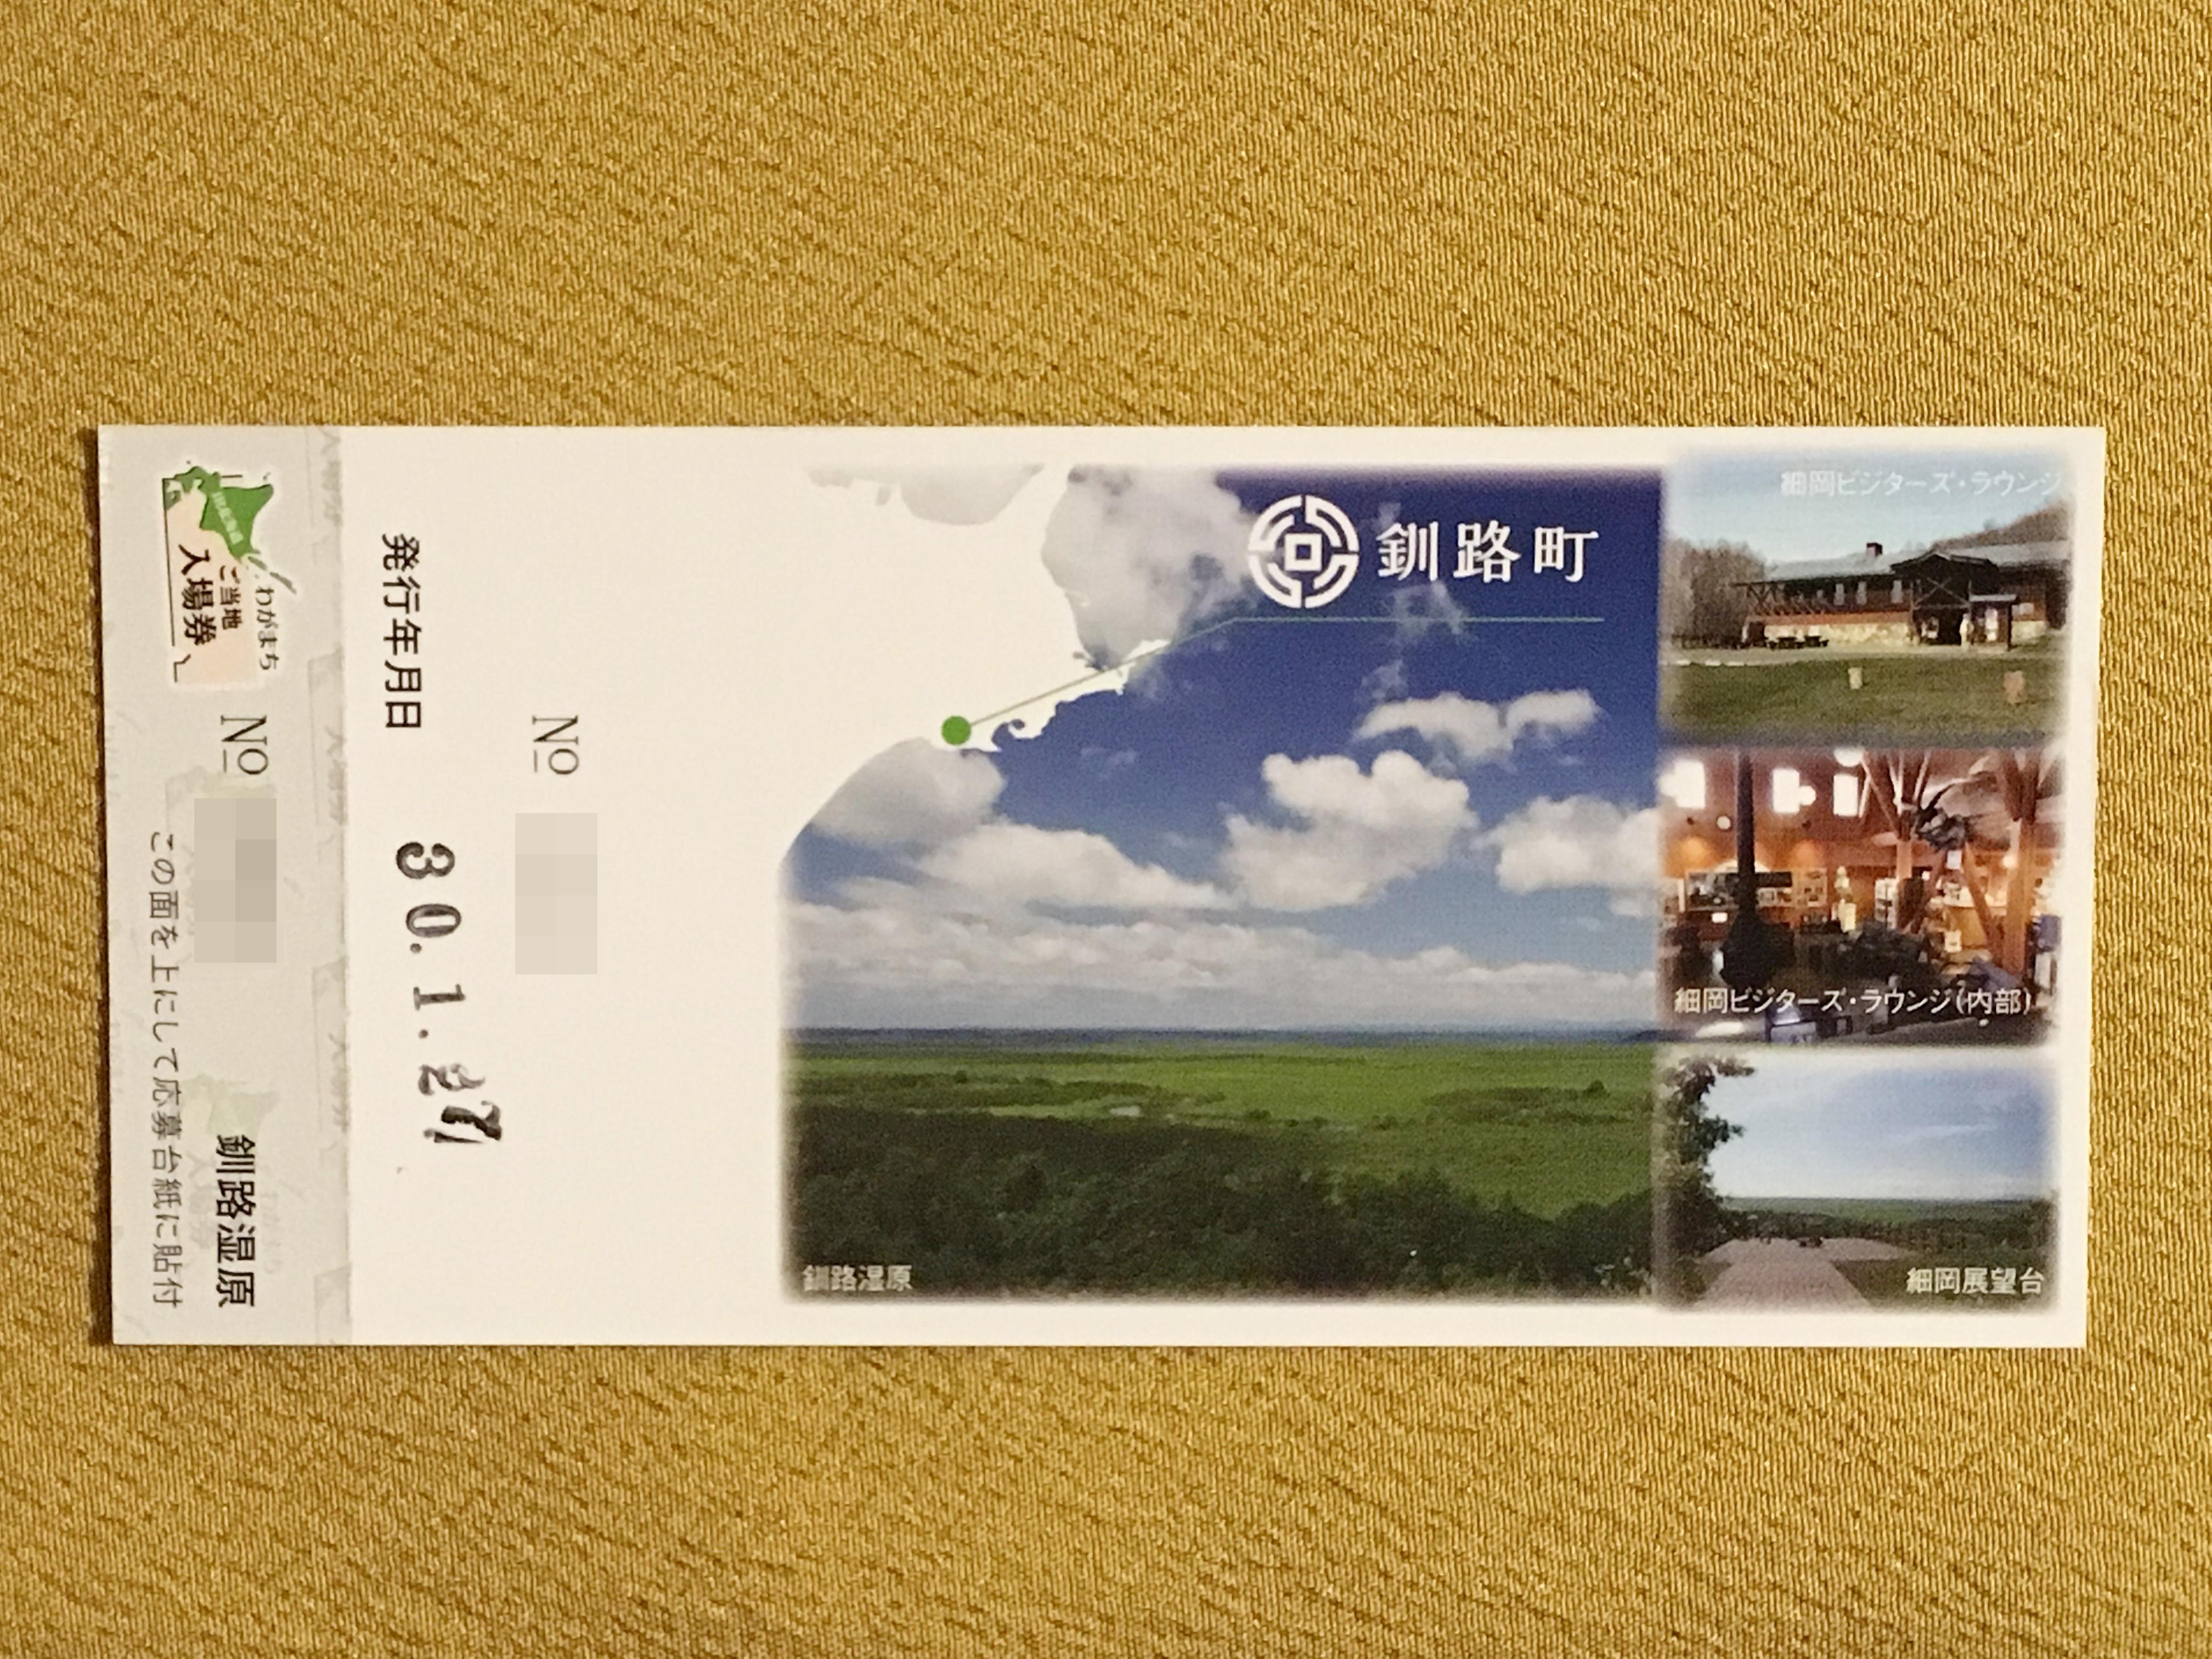 JR北海道ご当地入場券  釧路湿原駅裏.JPG